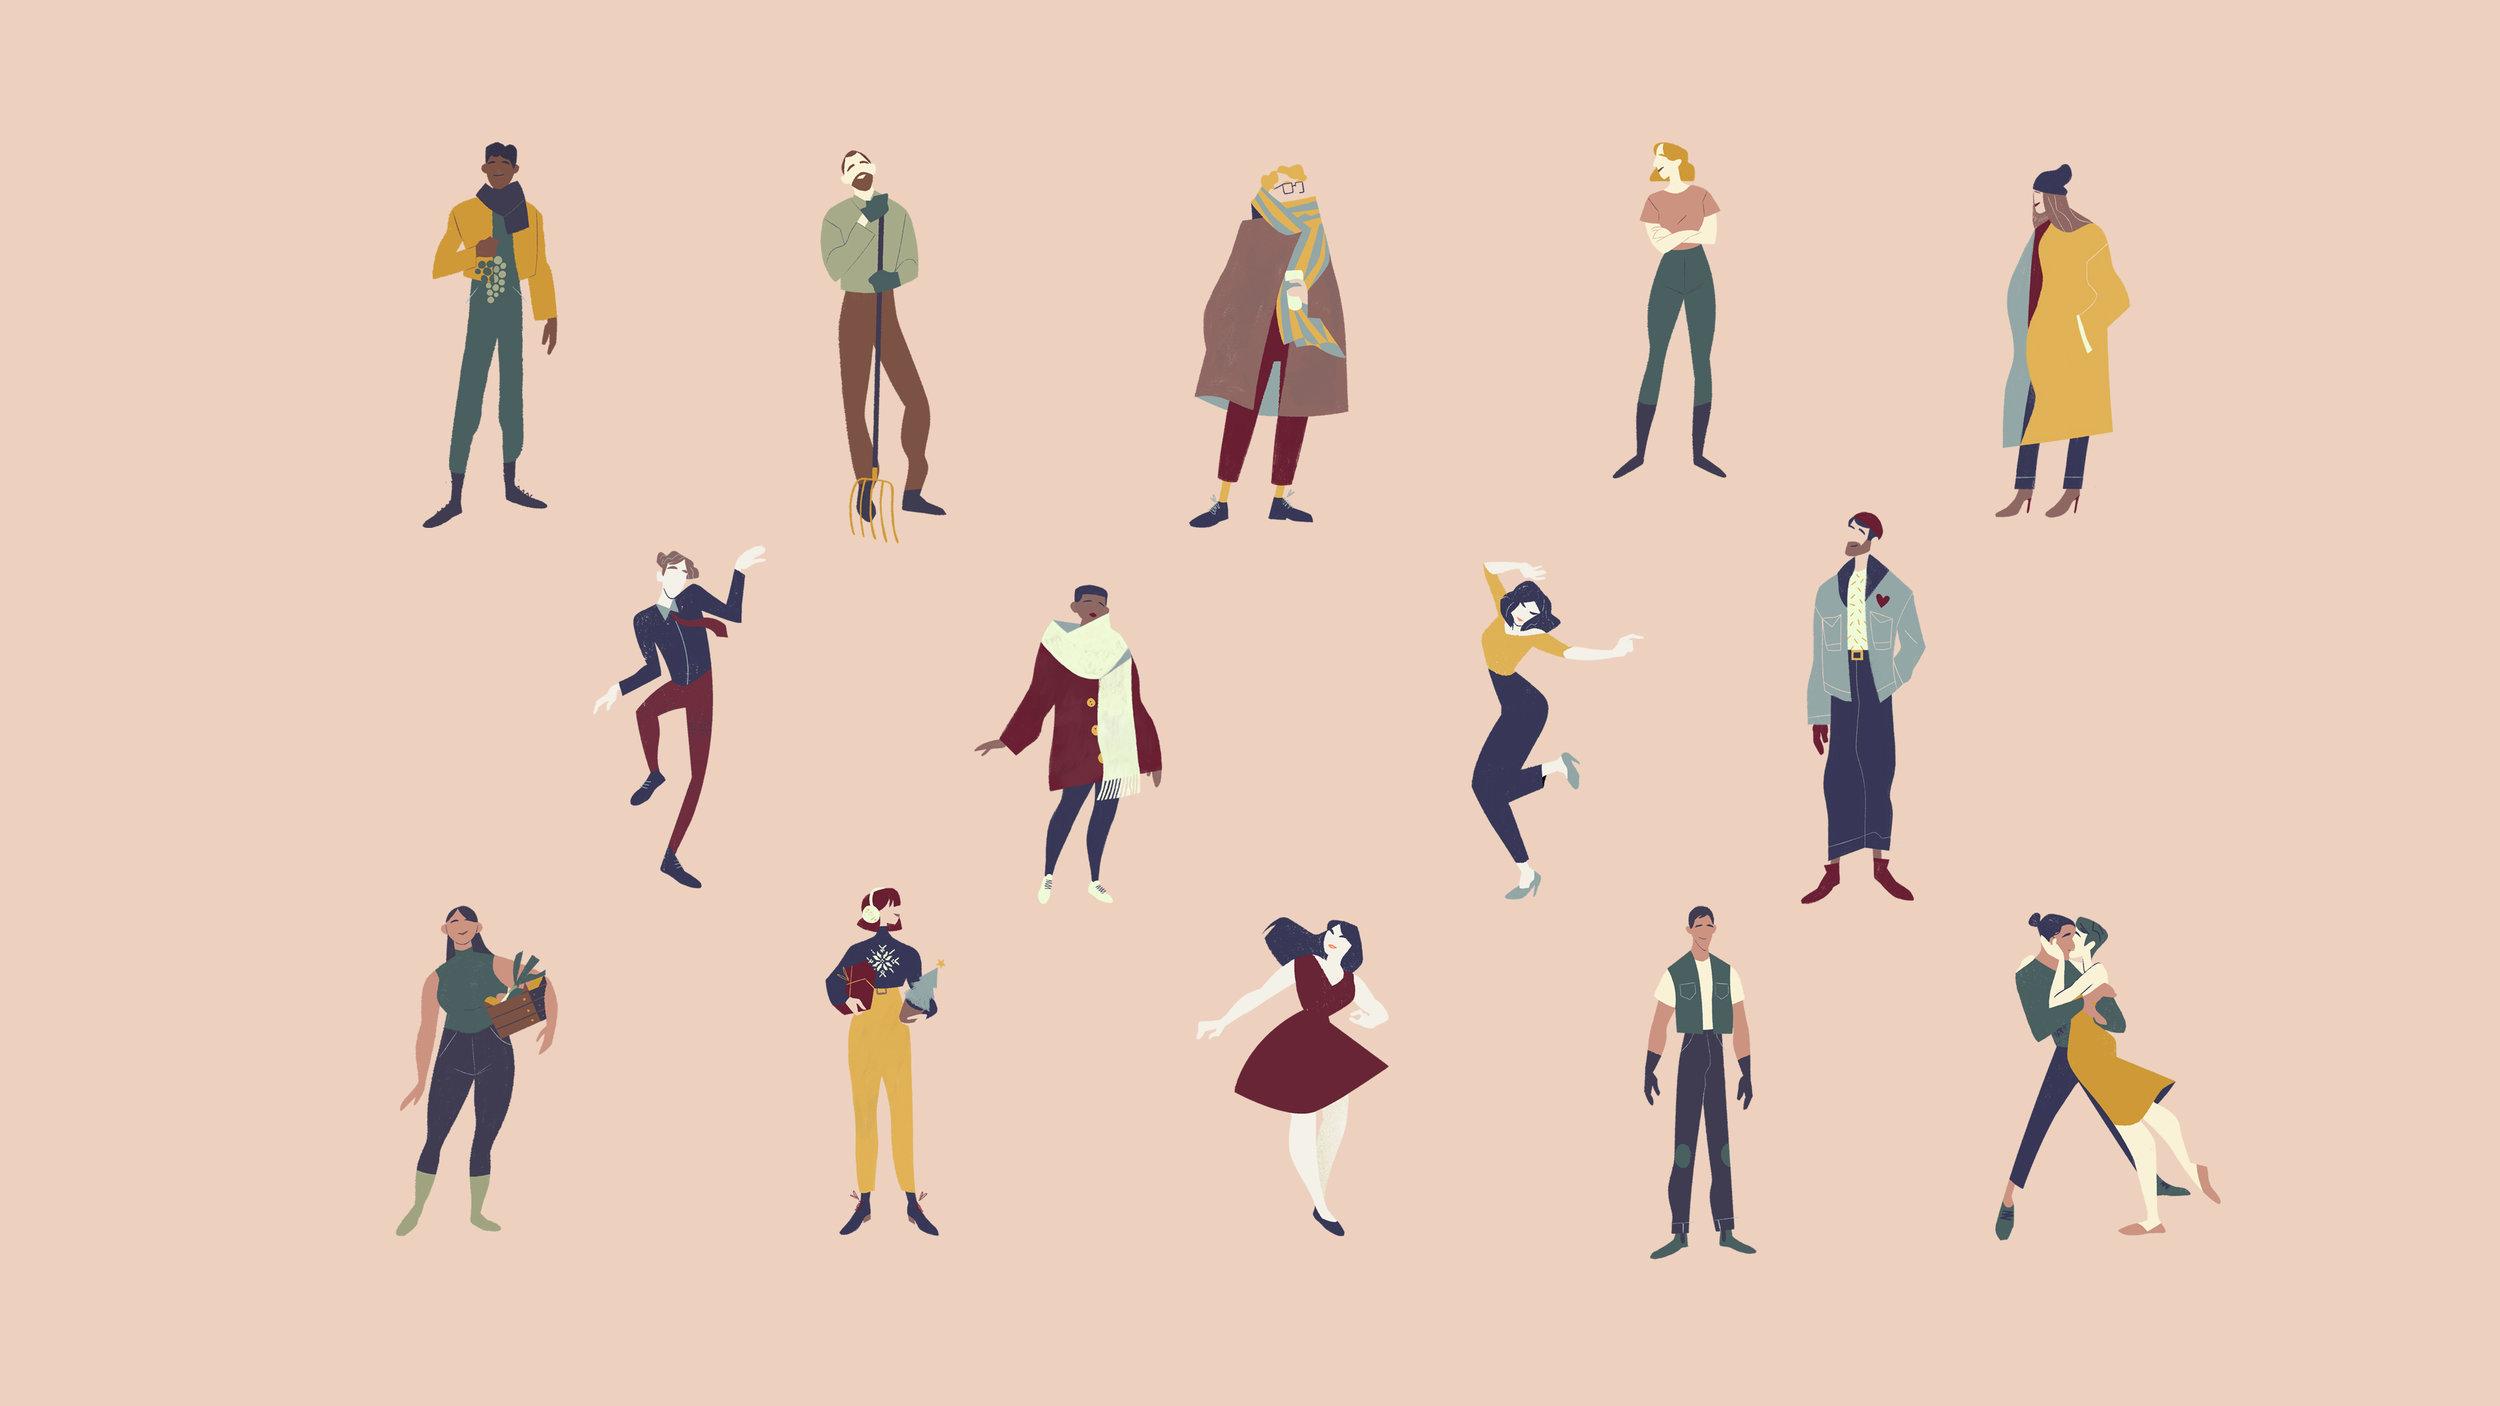 tom-goyon-illustration-characters.jpeg